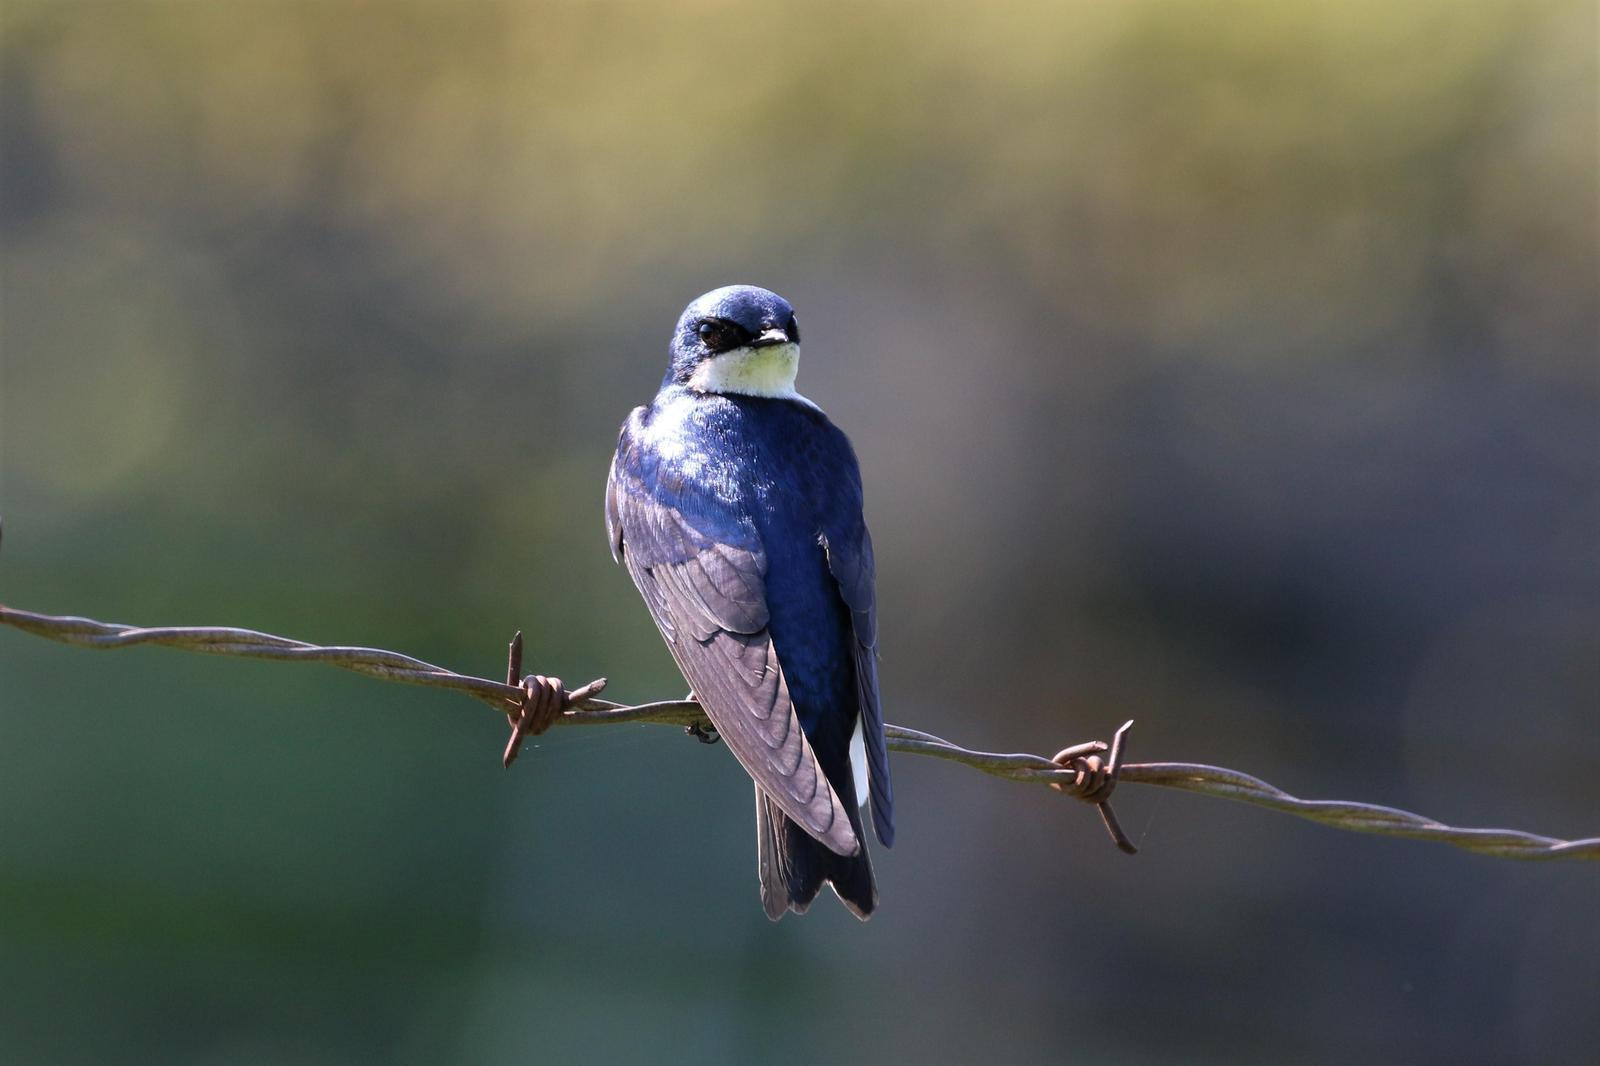 Tree Swallow Photo by Richard Jeffers